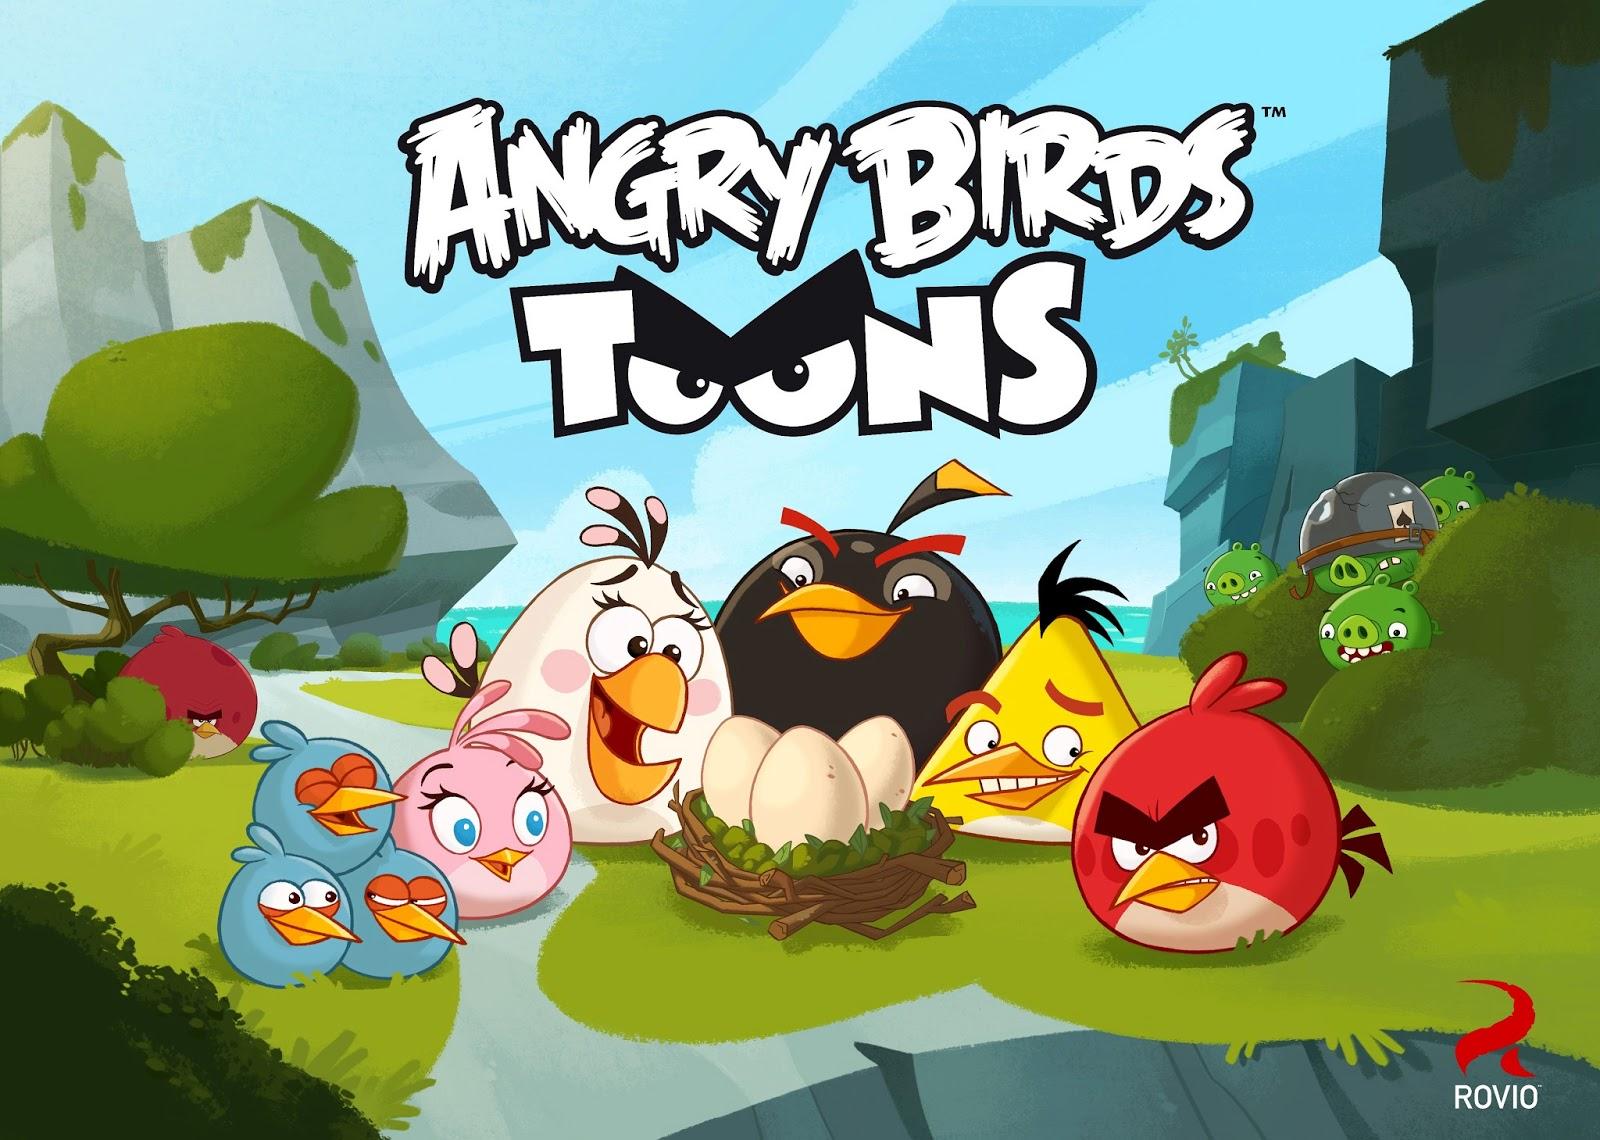 Angrybirds Francescanatale 05: La Web Angry Birds: Angry Birds Toons